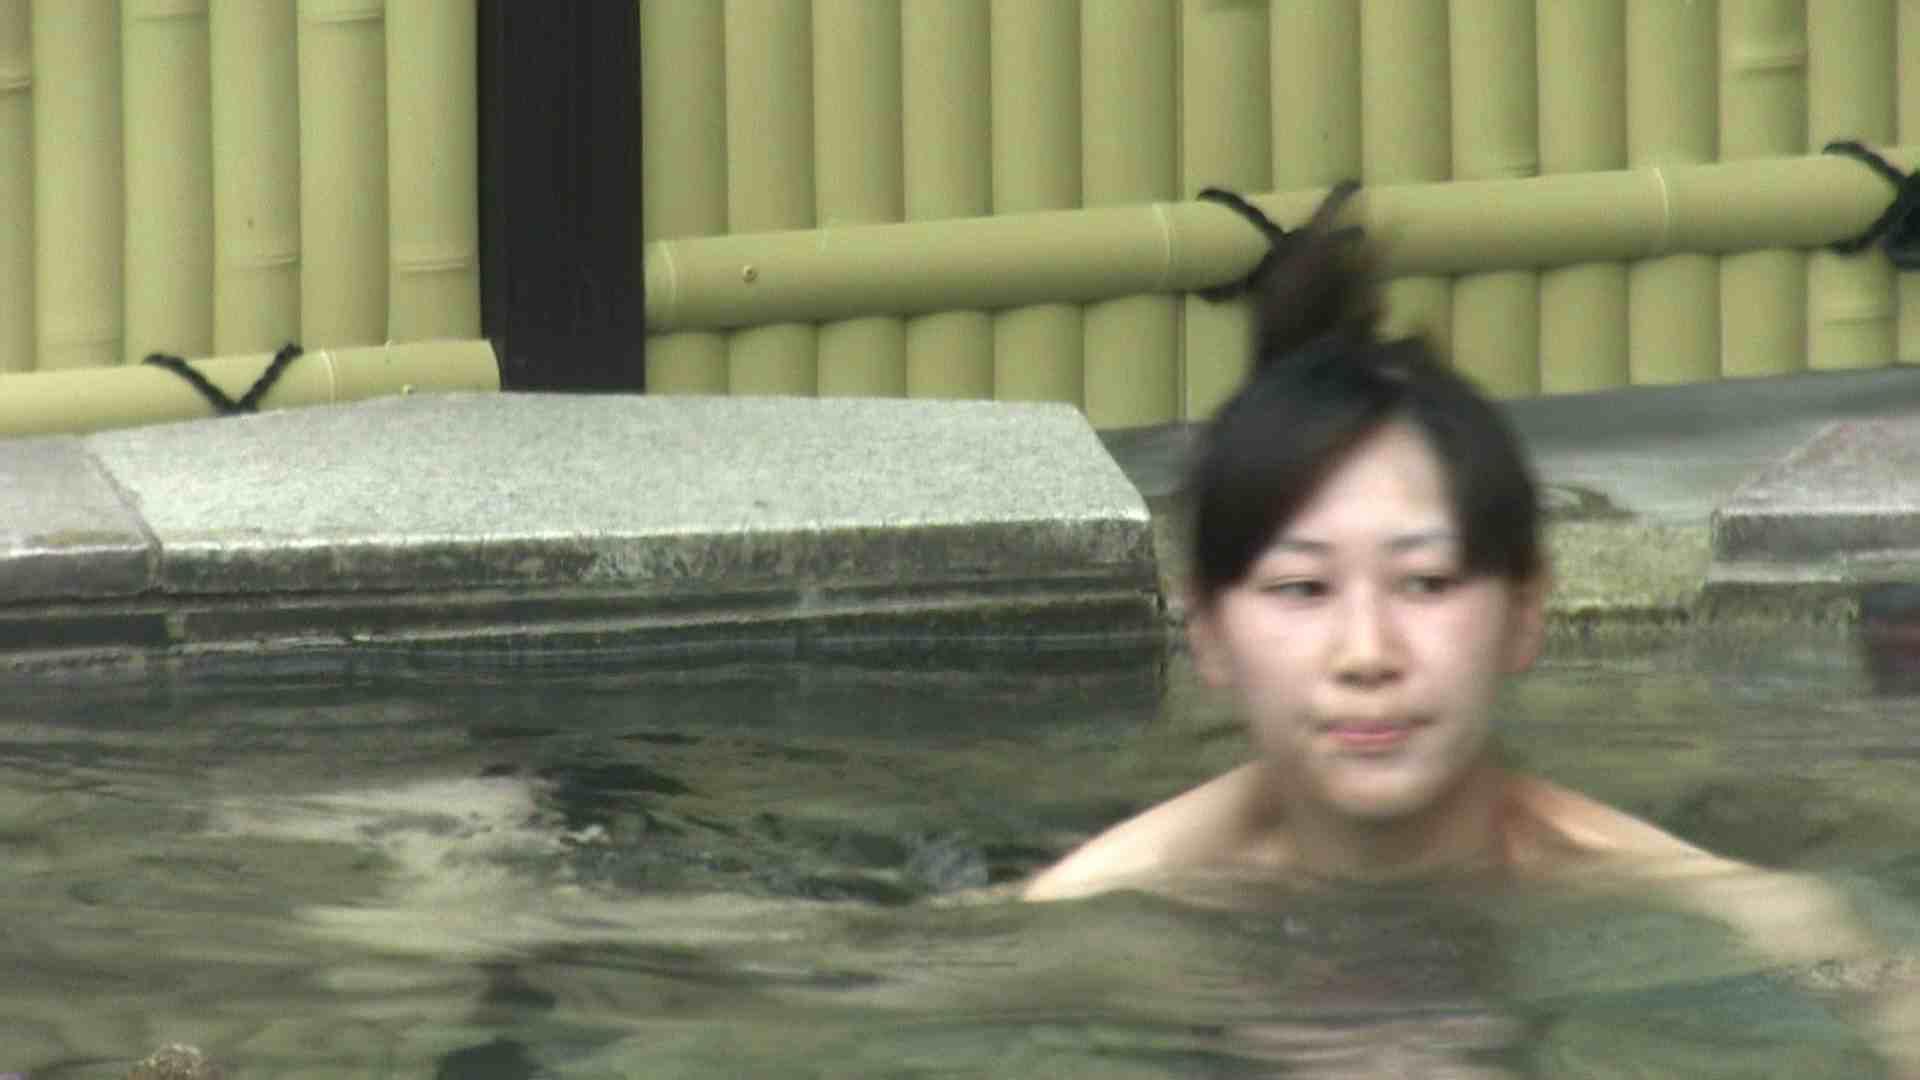 Aquaな露天風呂Vol.665 HなOL   盗撮  104pic 72